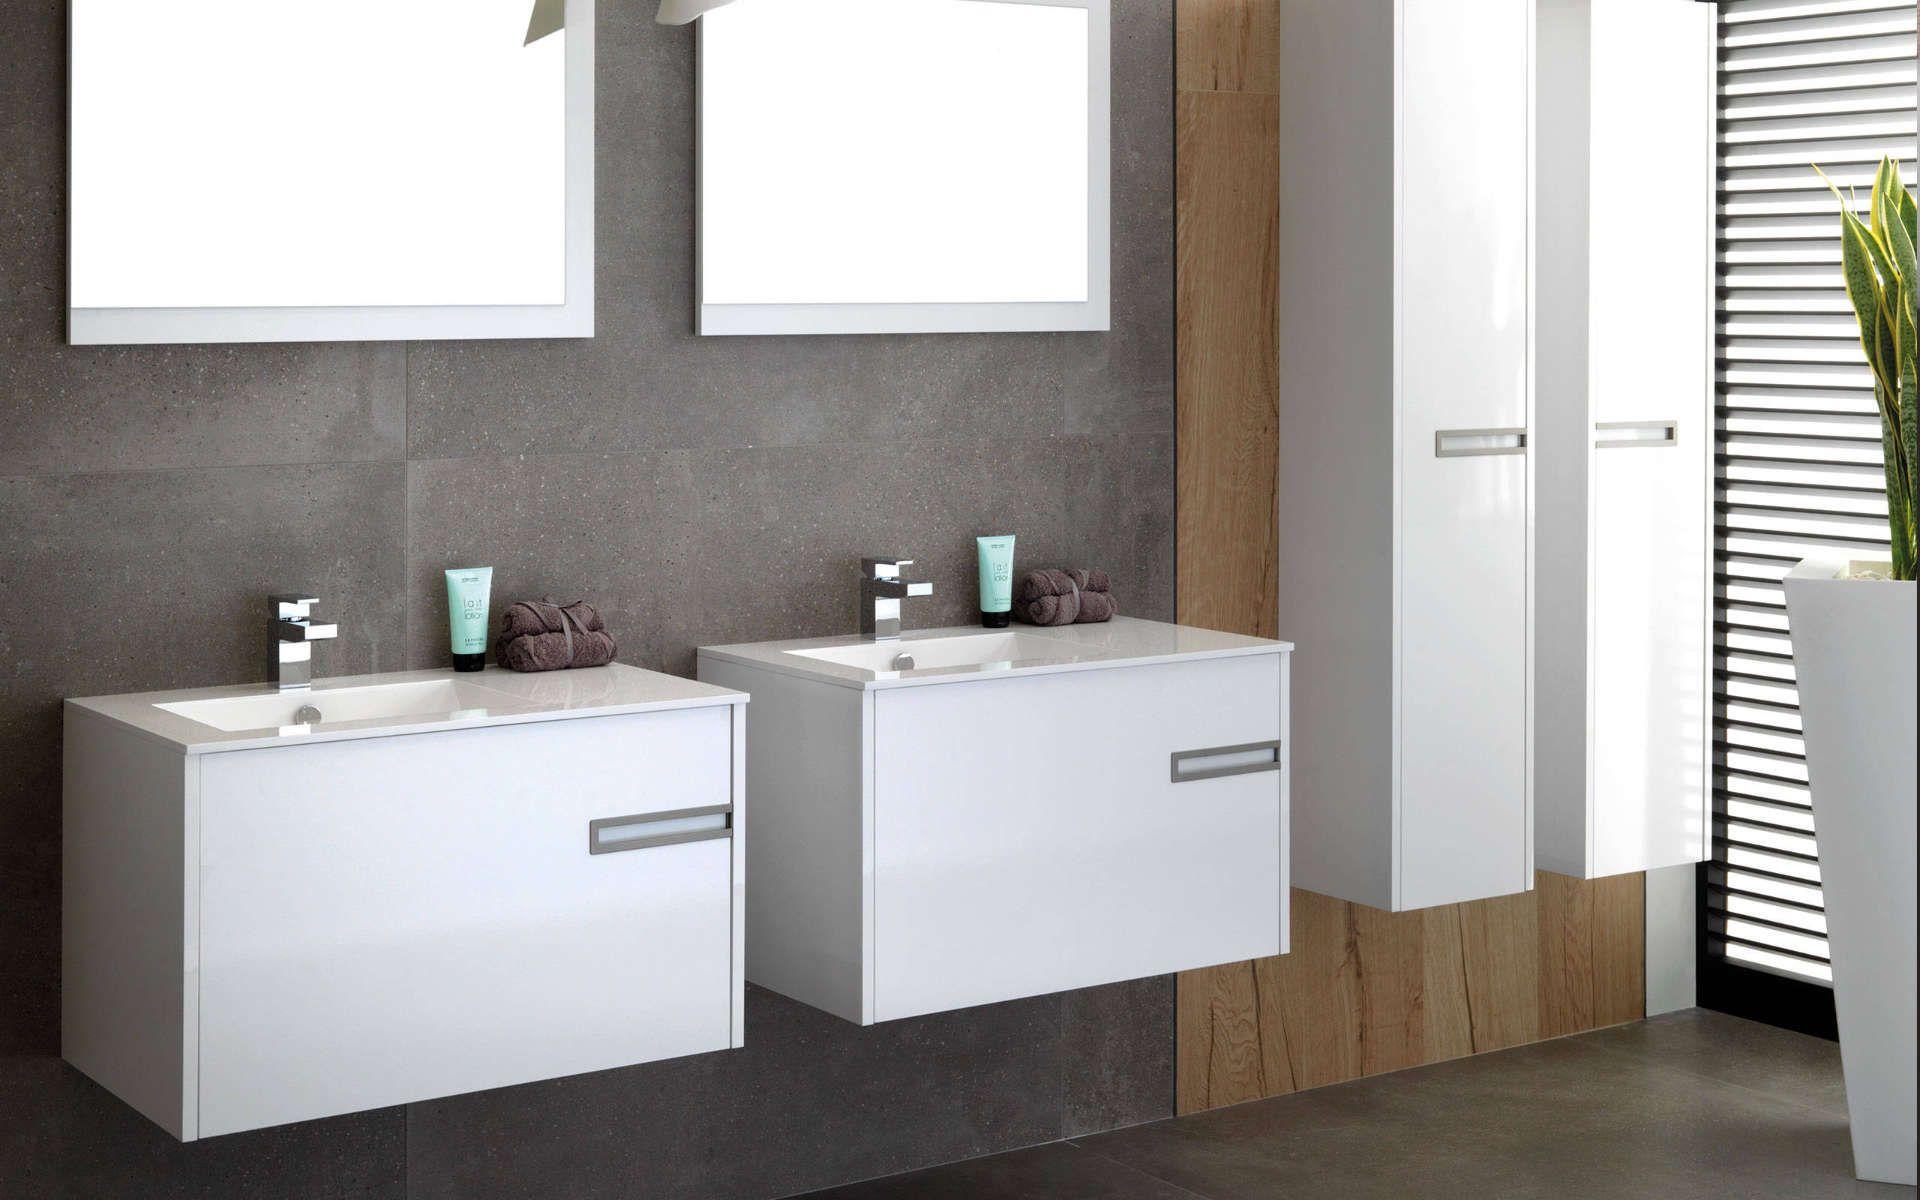 Bathroom Vanity Bathroom Vanity Vanity Bathroom